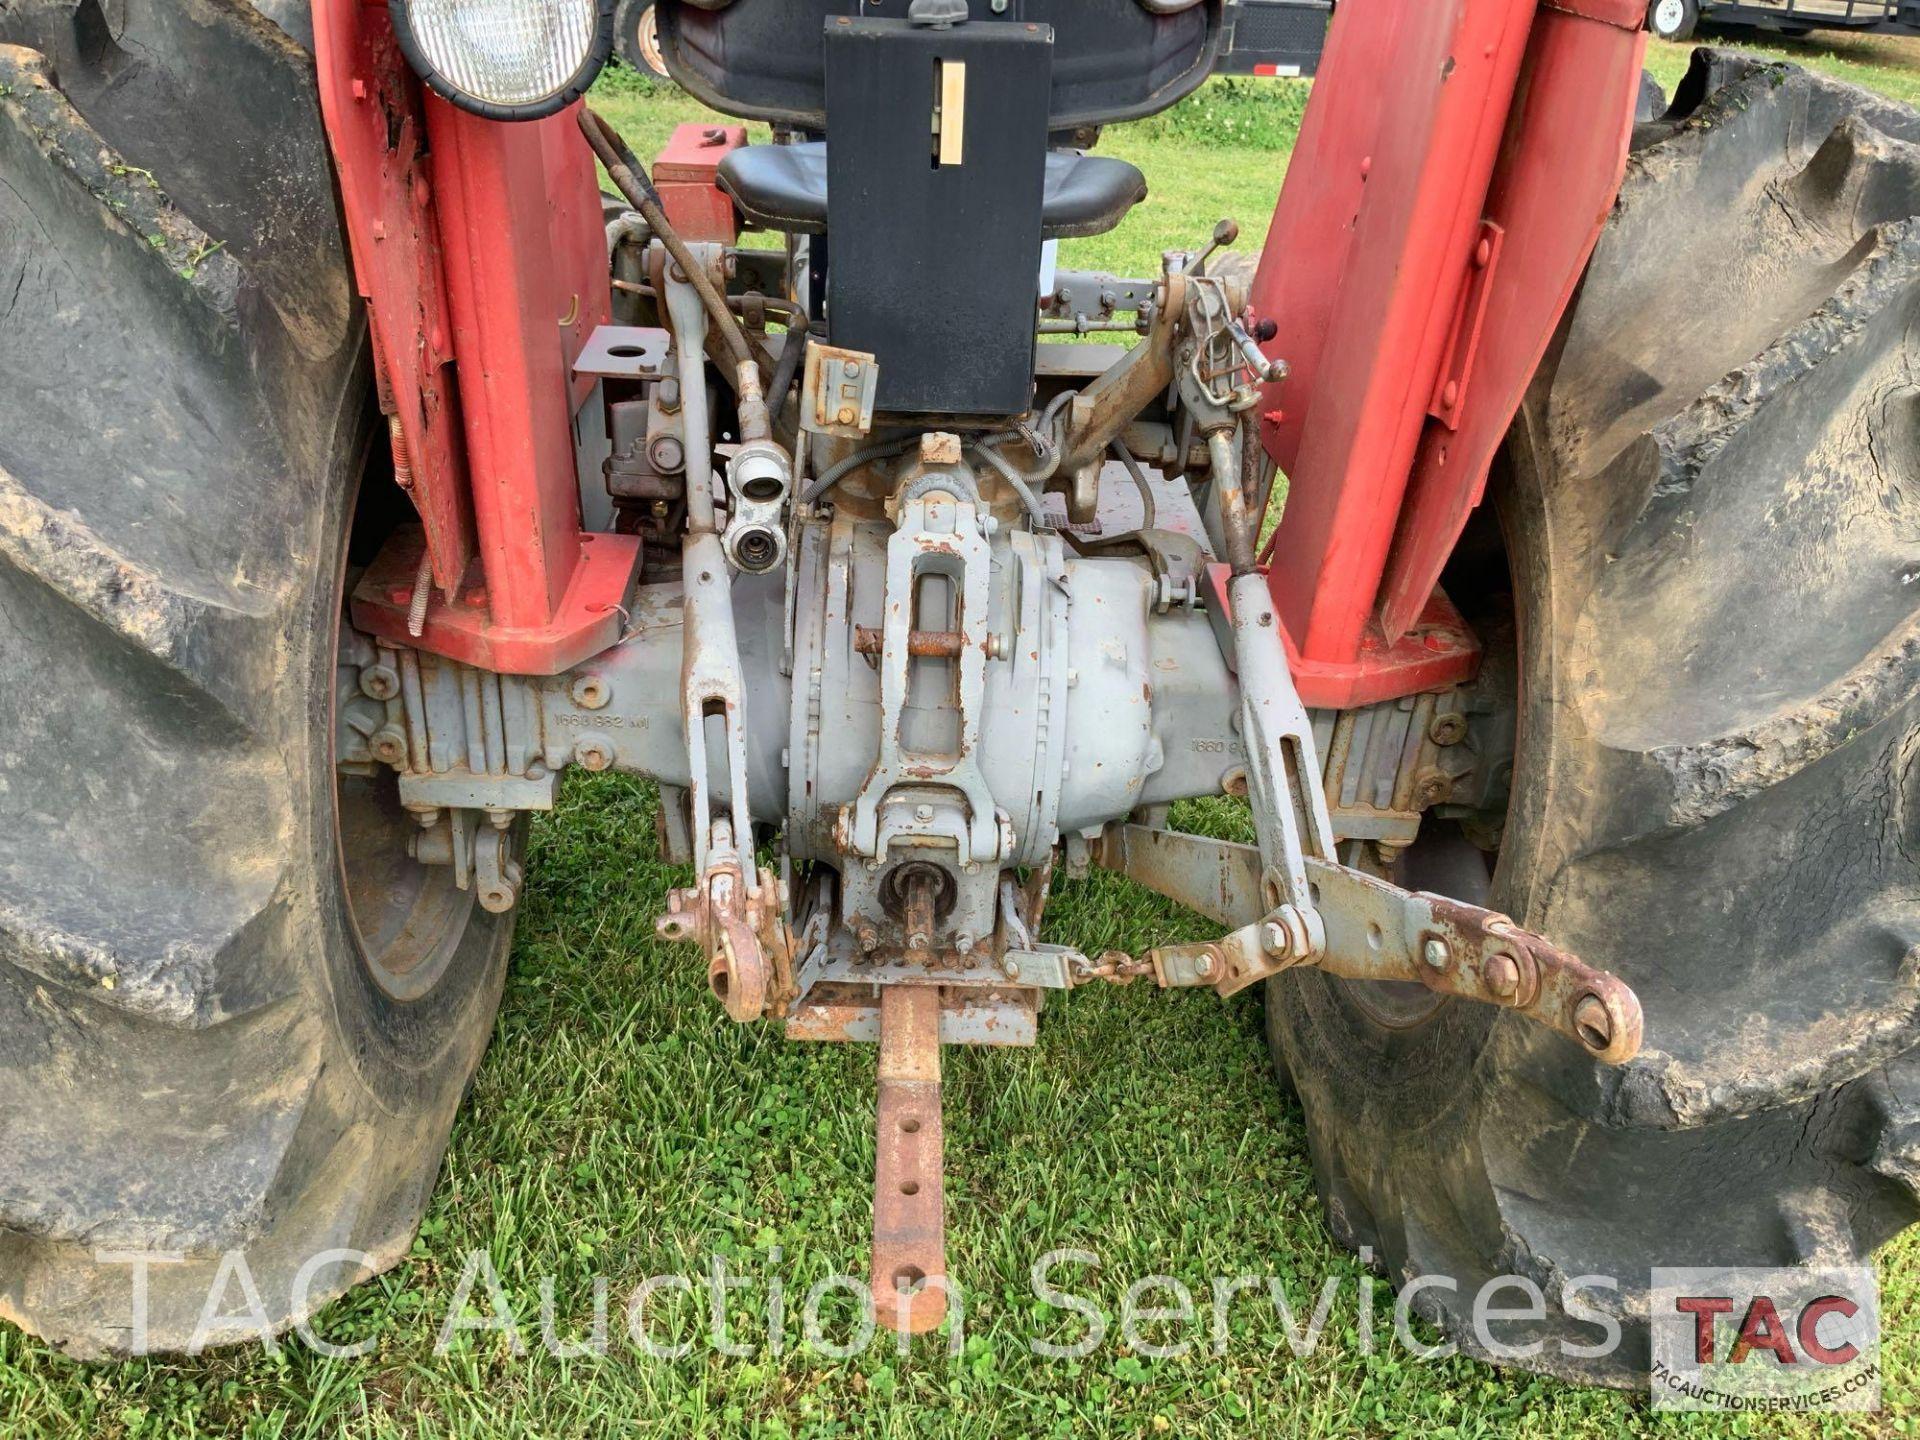 Massey Ferguson 275 Farm Tractor - Image 11 of 25